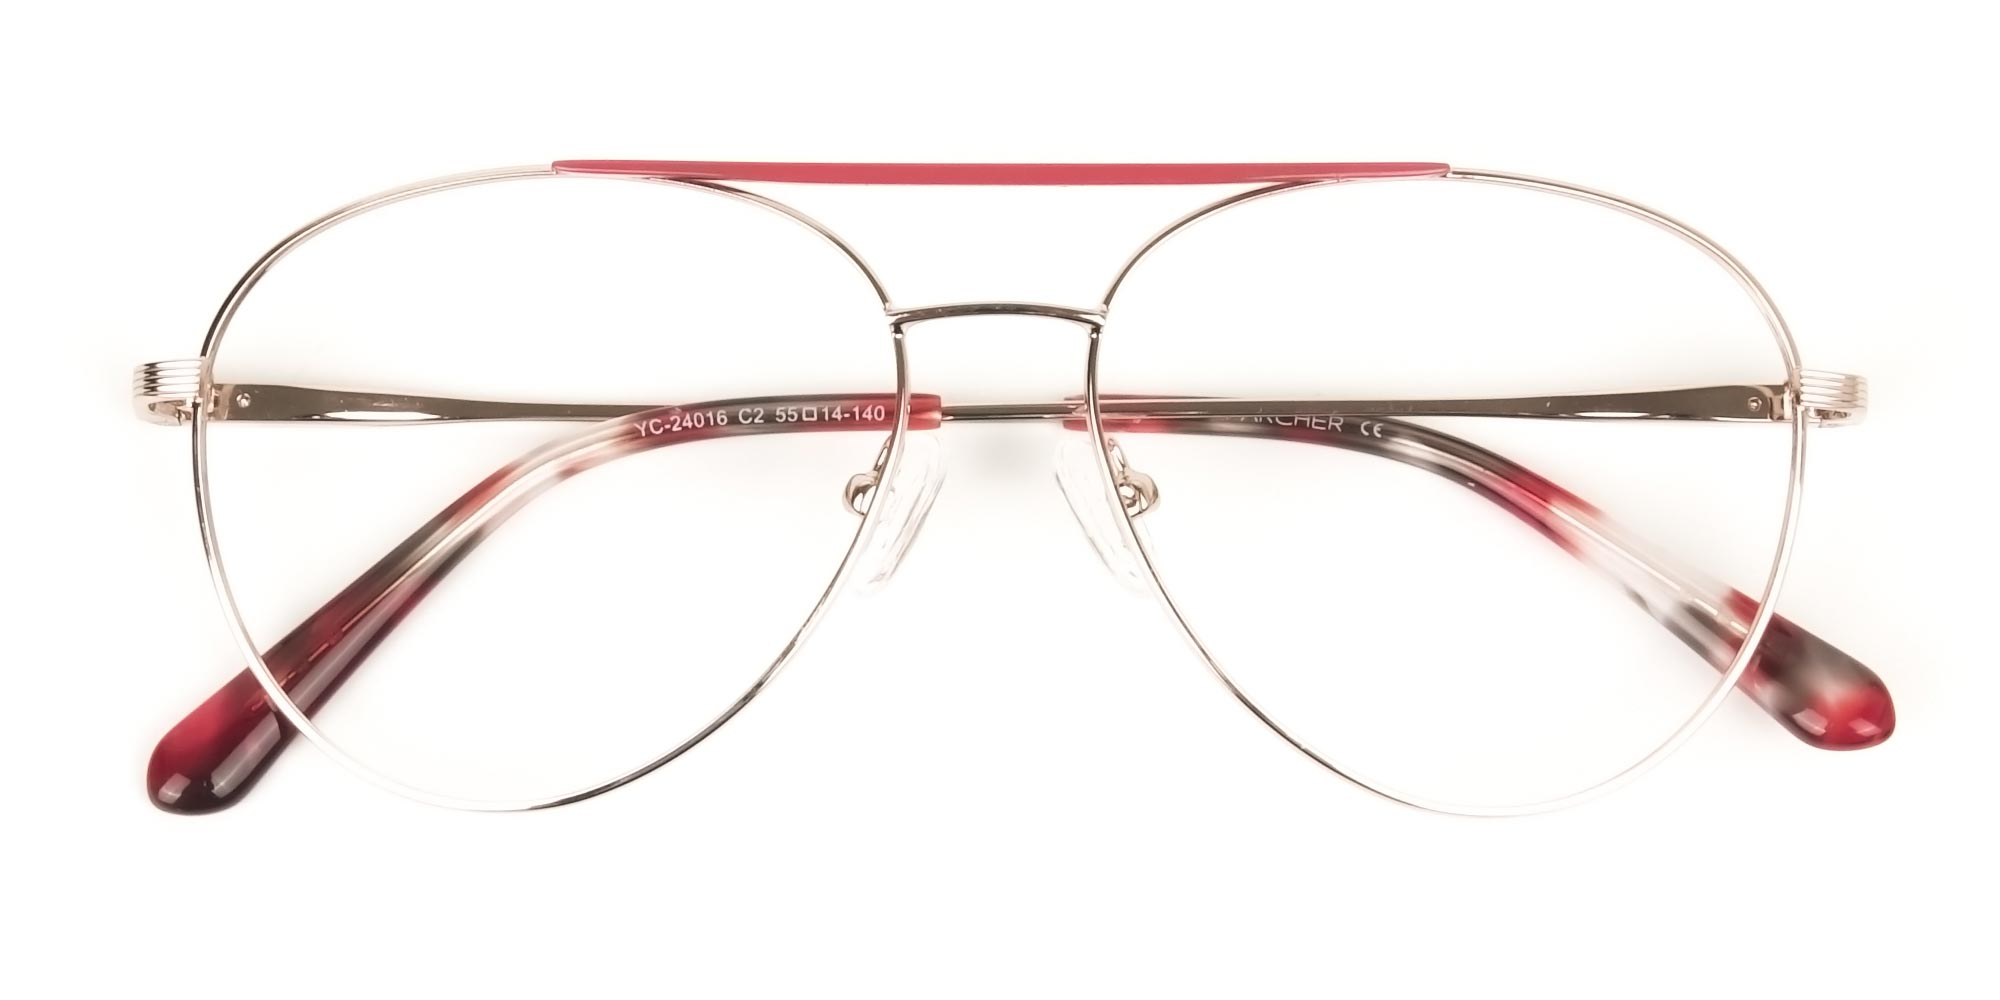 Red & Gold Flat Bridge Aviator Glasses